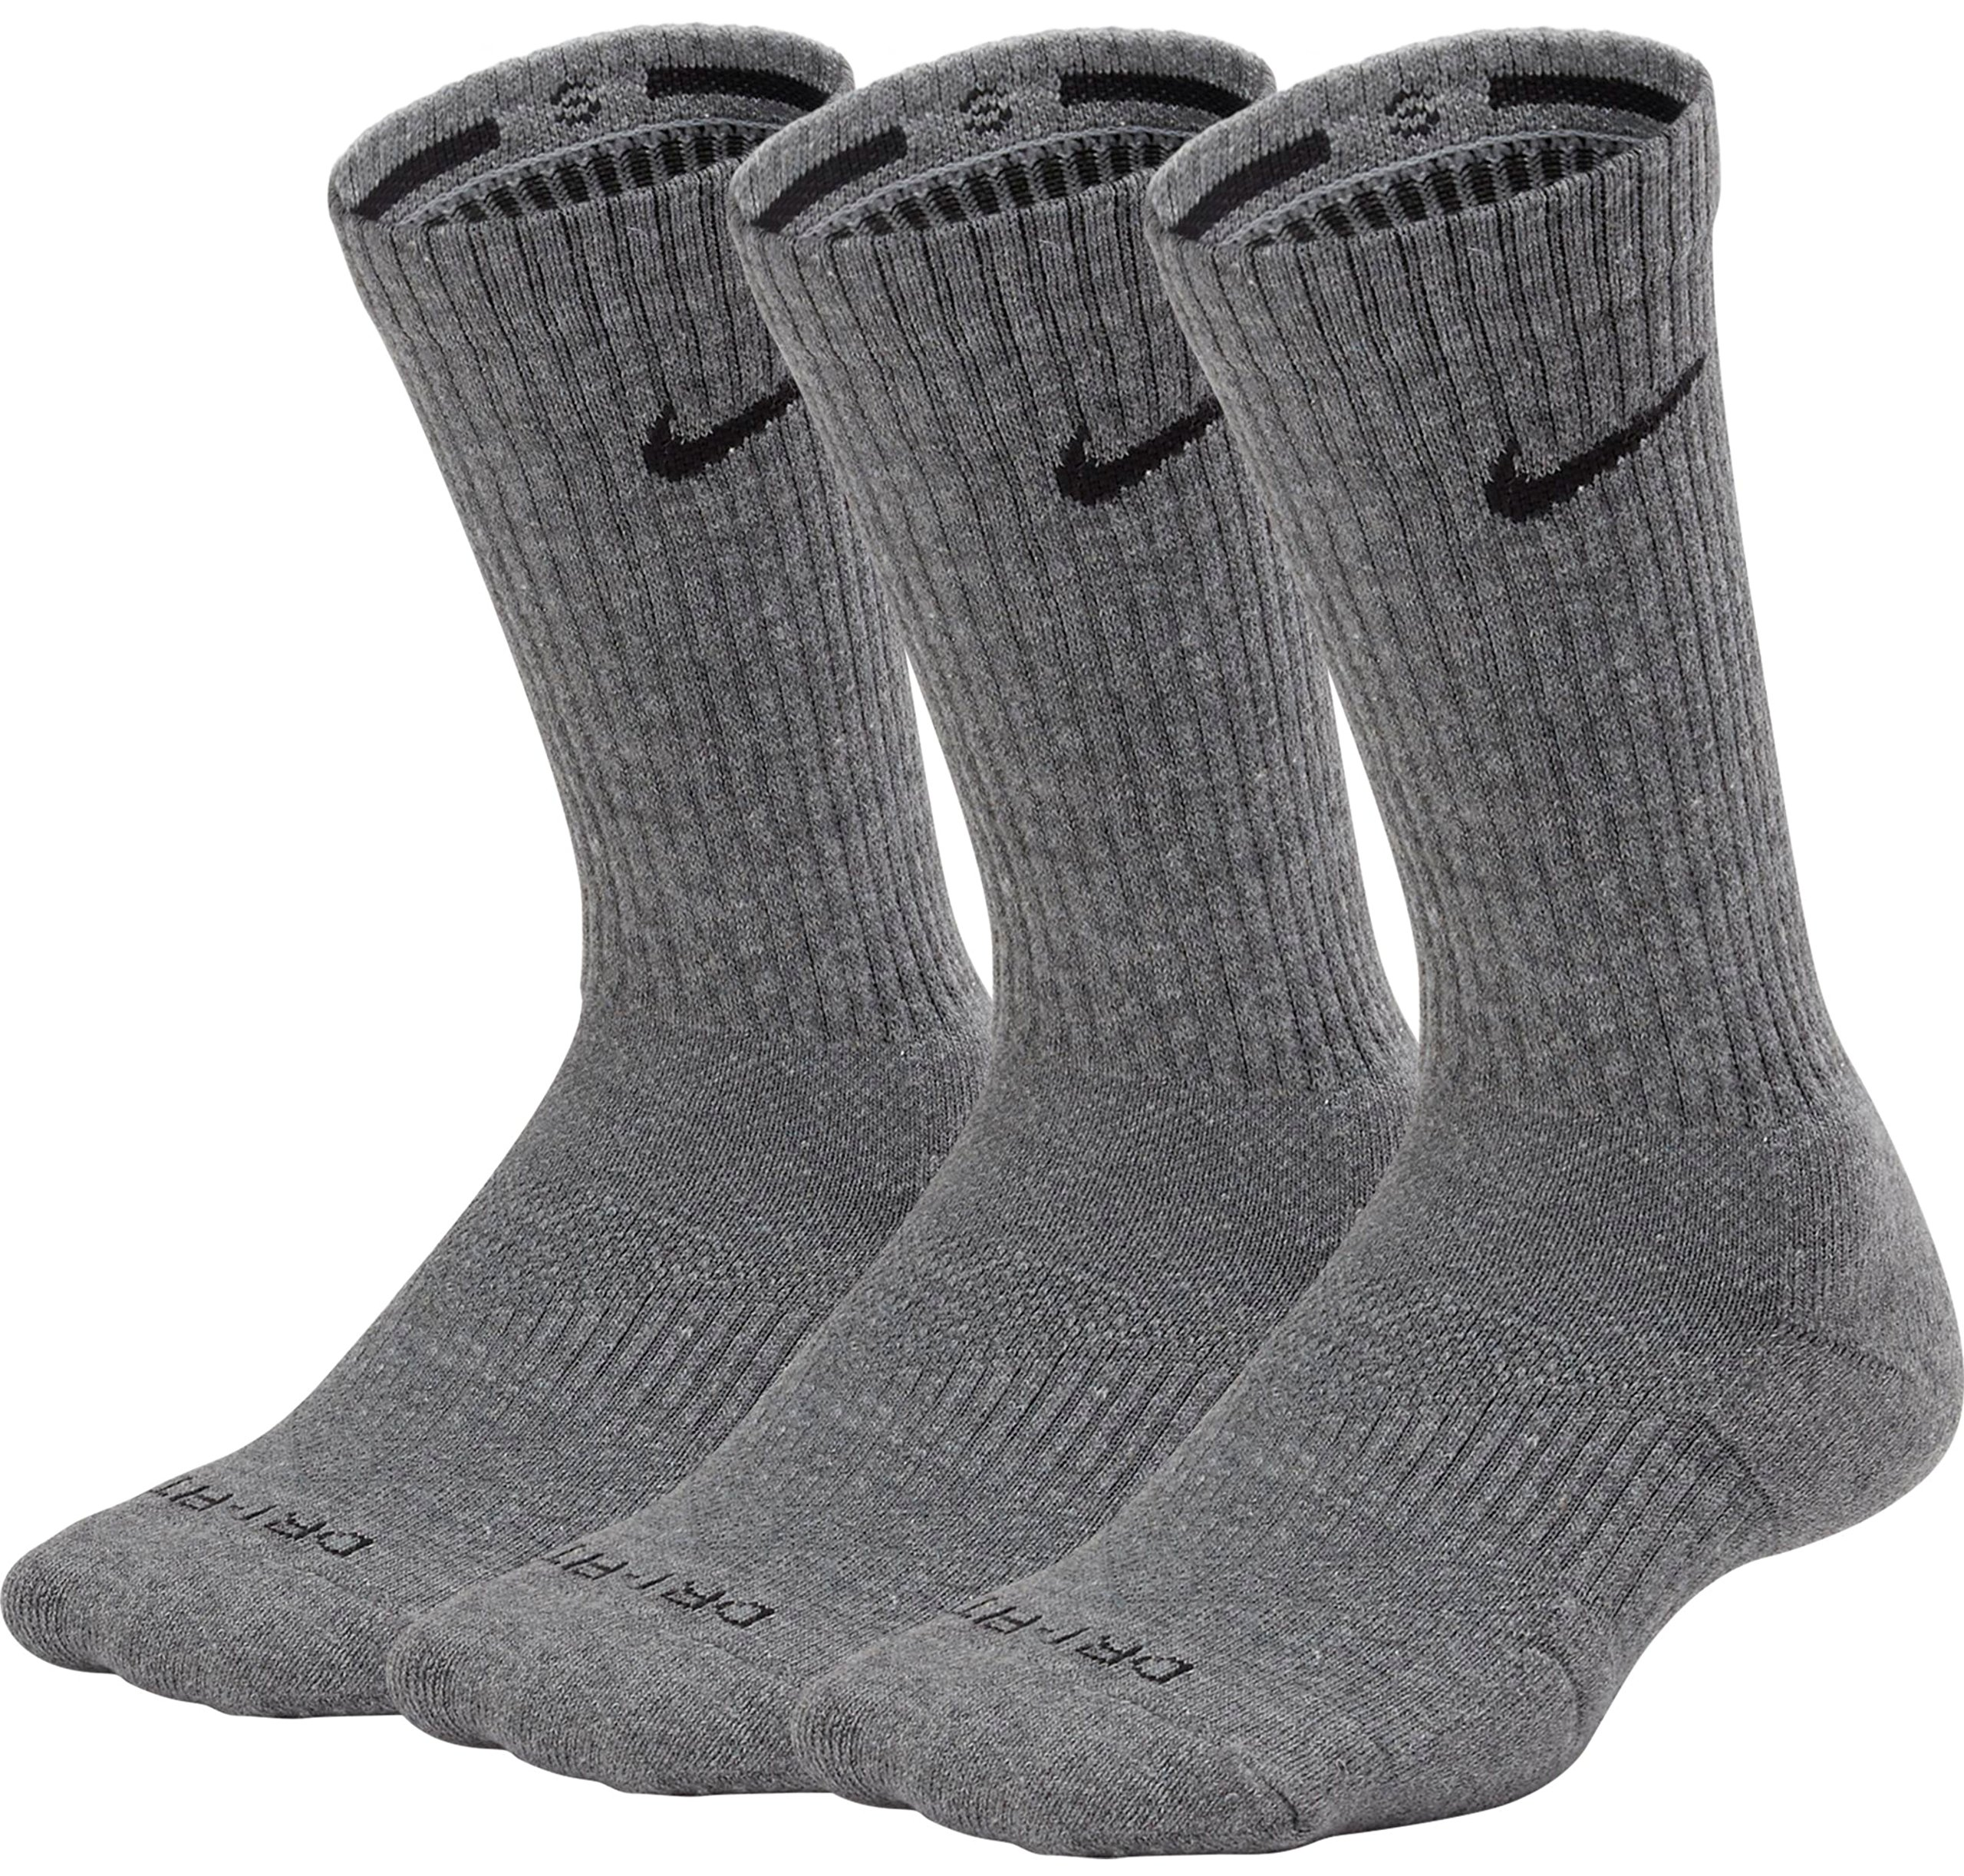 Nike Unisex Dry Cushion Crew Training Sock (3 Pair) (Carbon Heather/Black, Large)